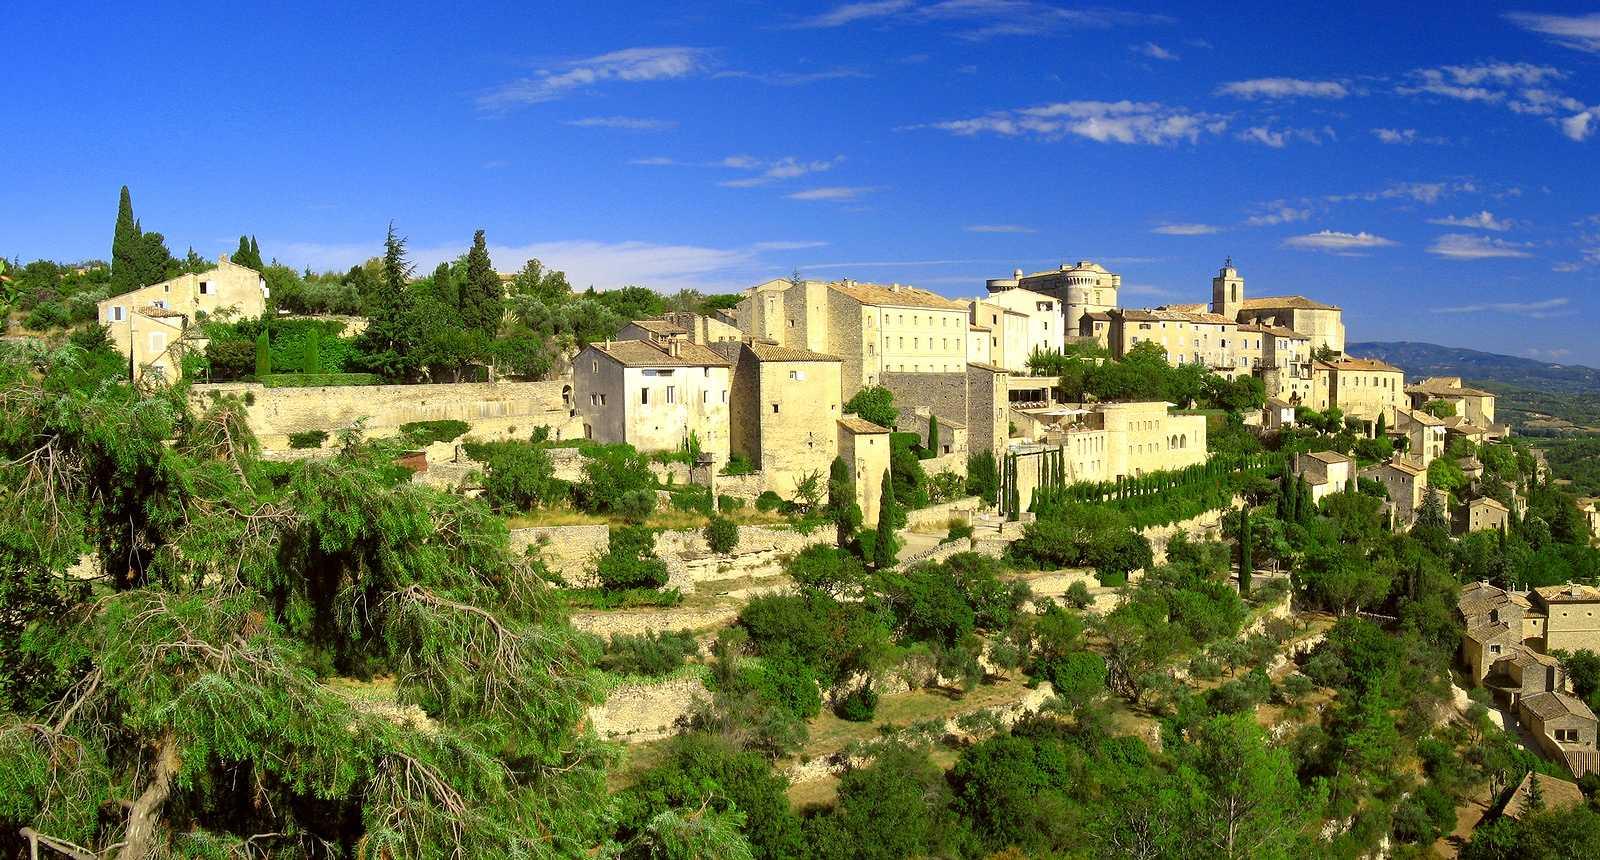 Village de Gordes, Luberon